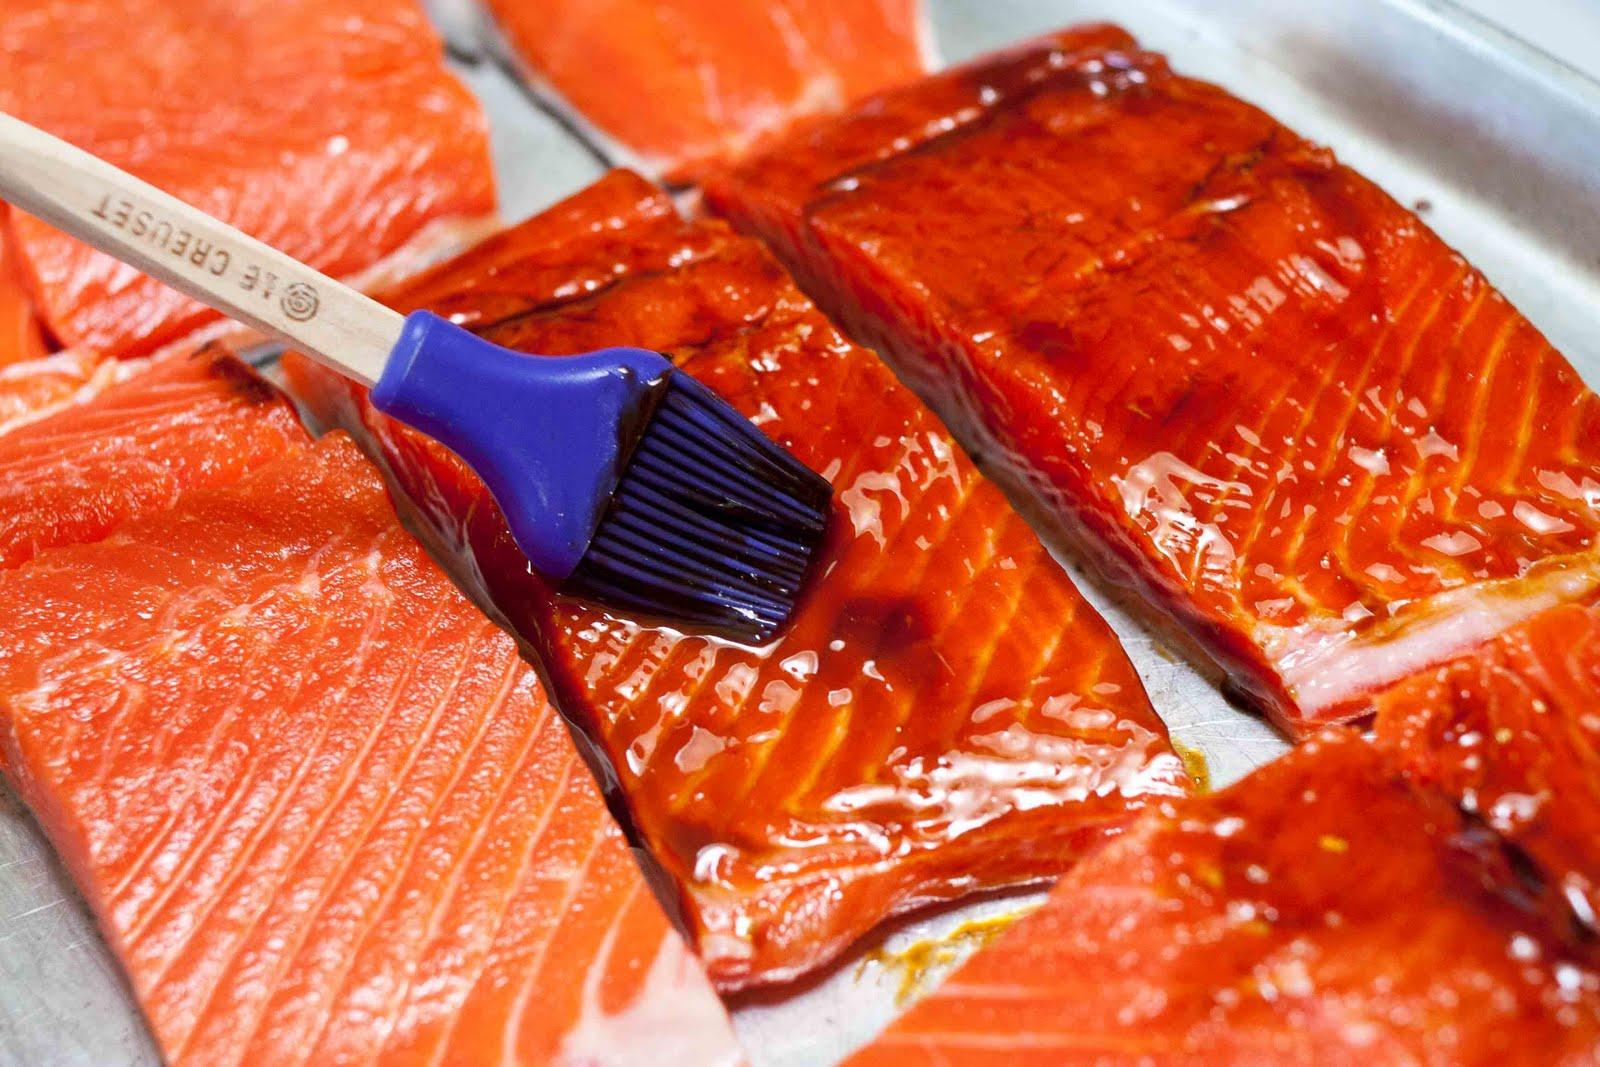 FOODjimoto: Grilled Salmon with Wasabi Mayo & Furikake